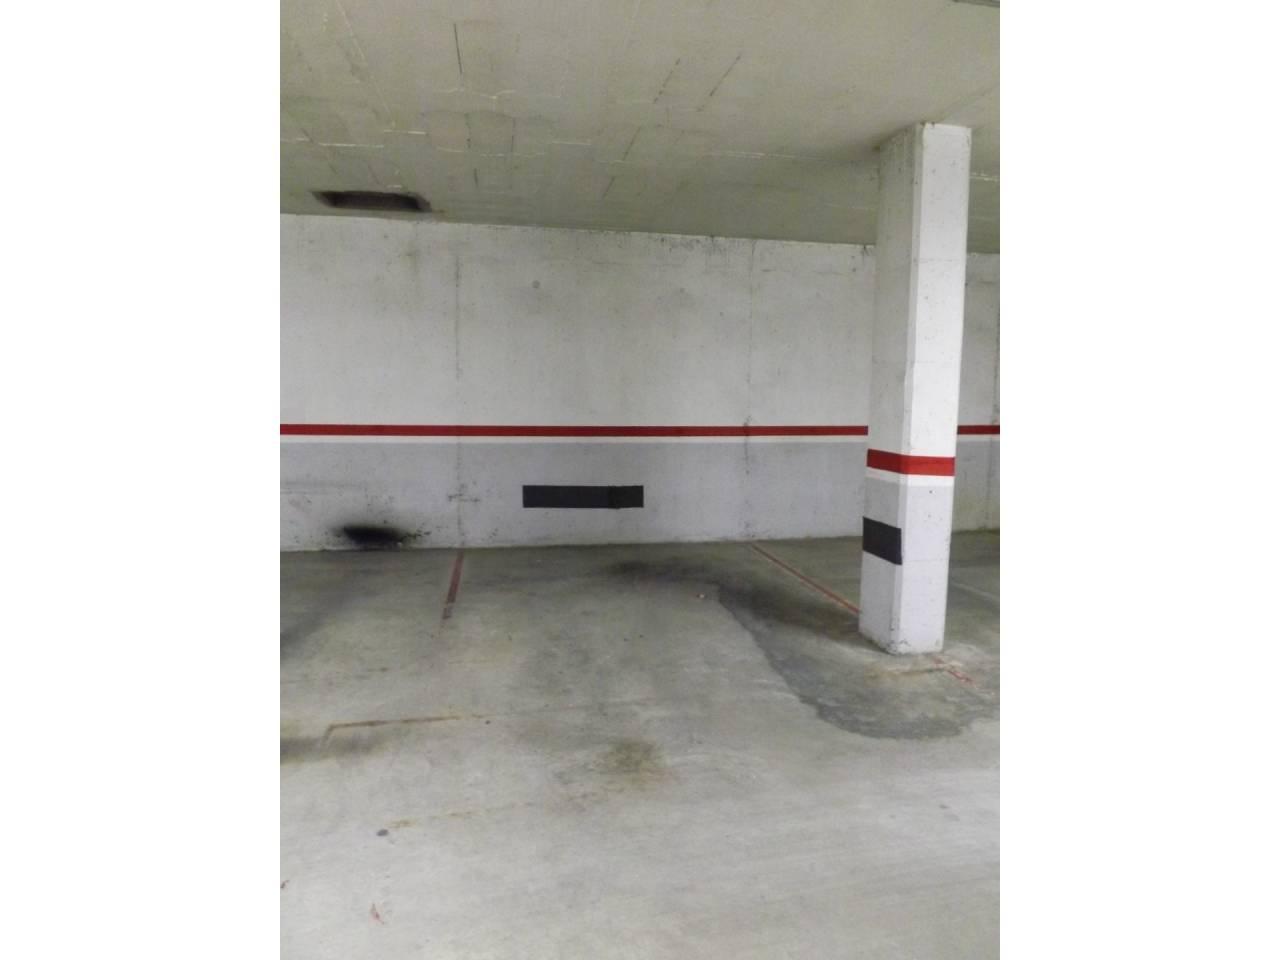 Location Parking voiture  Calle doctor trueta. Finques pardas - se alquila plaza de parking cerca del centro de